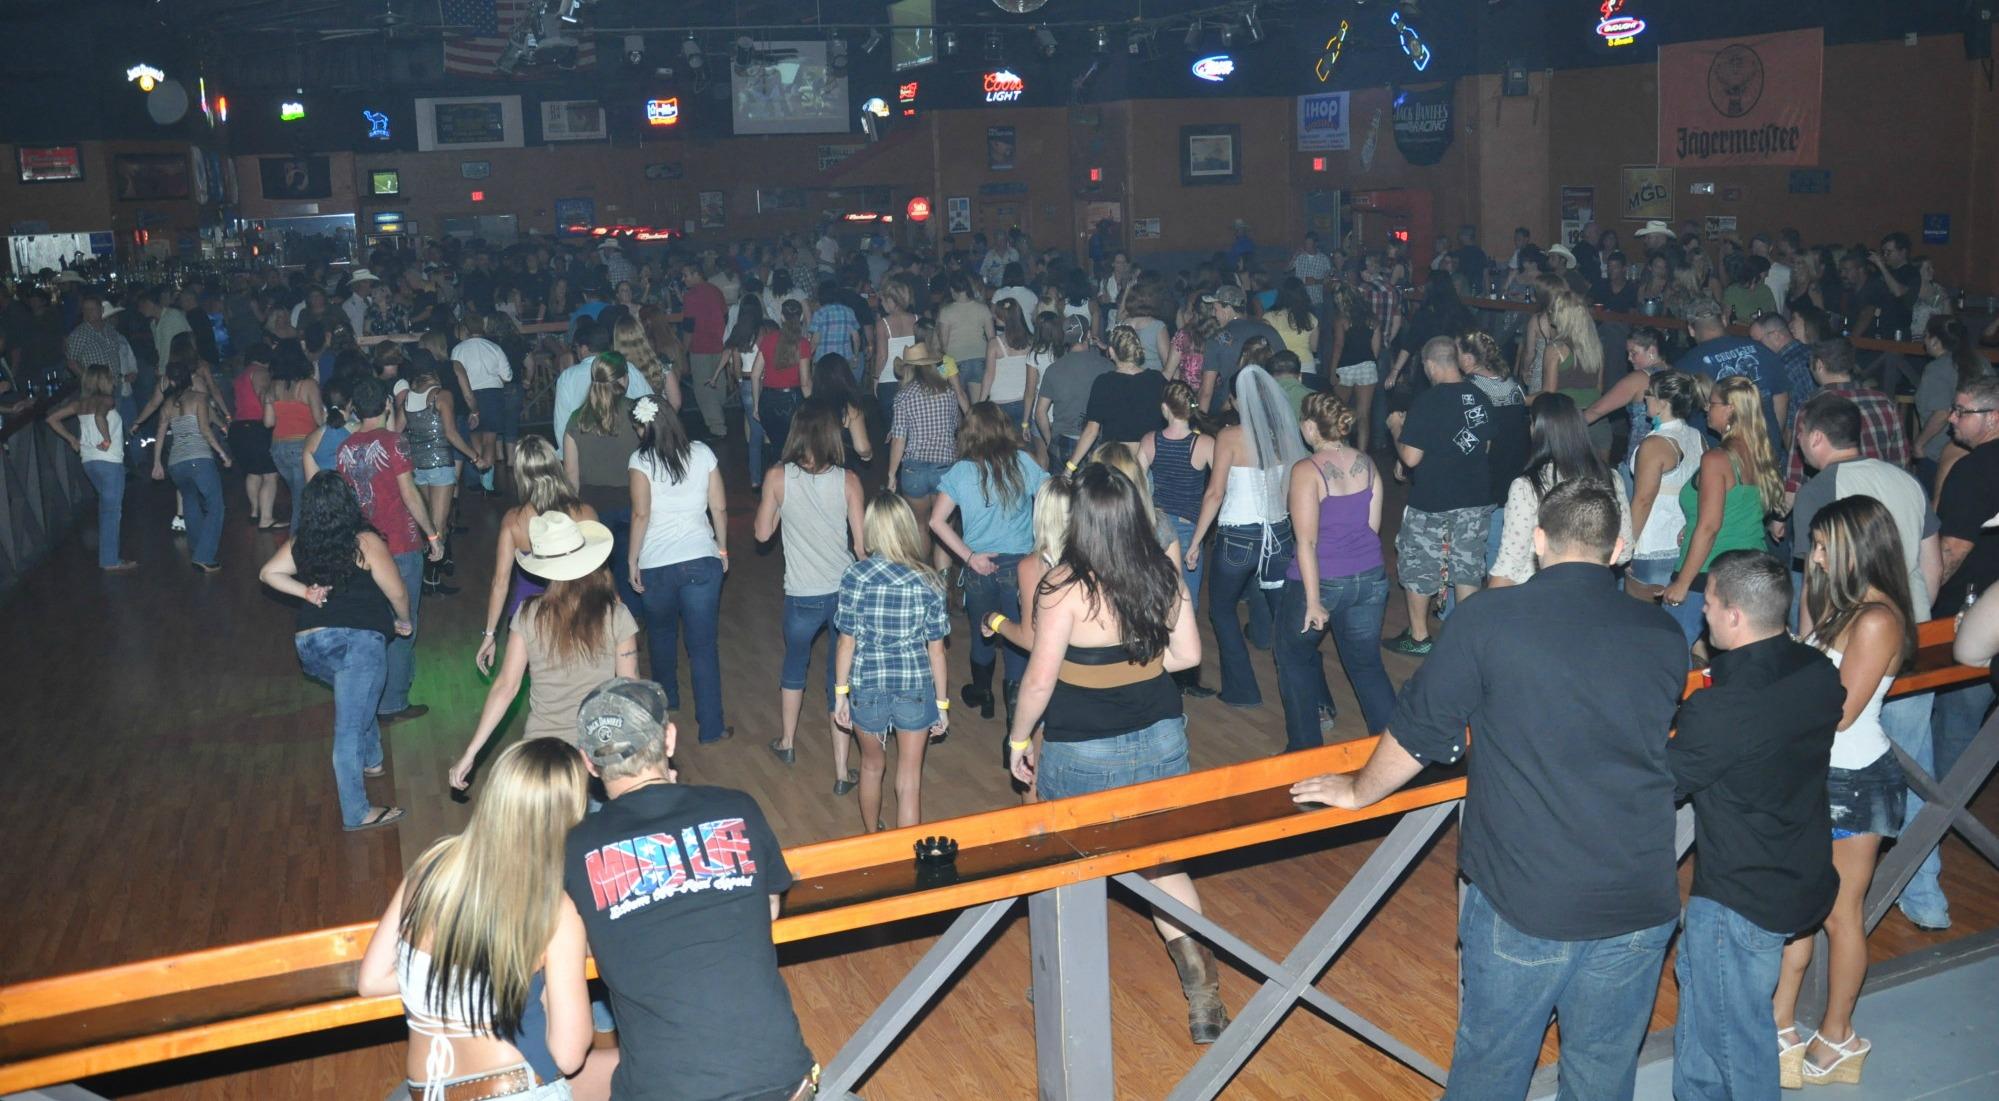 Waterin trough dance saloon